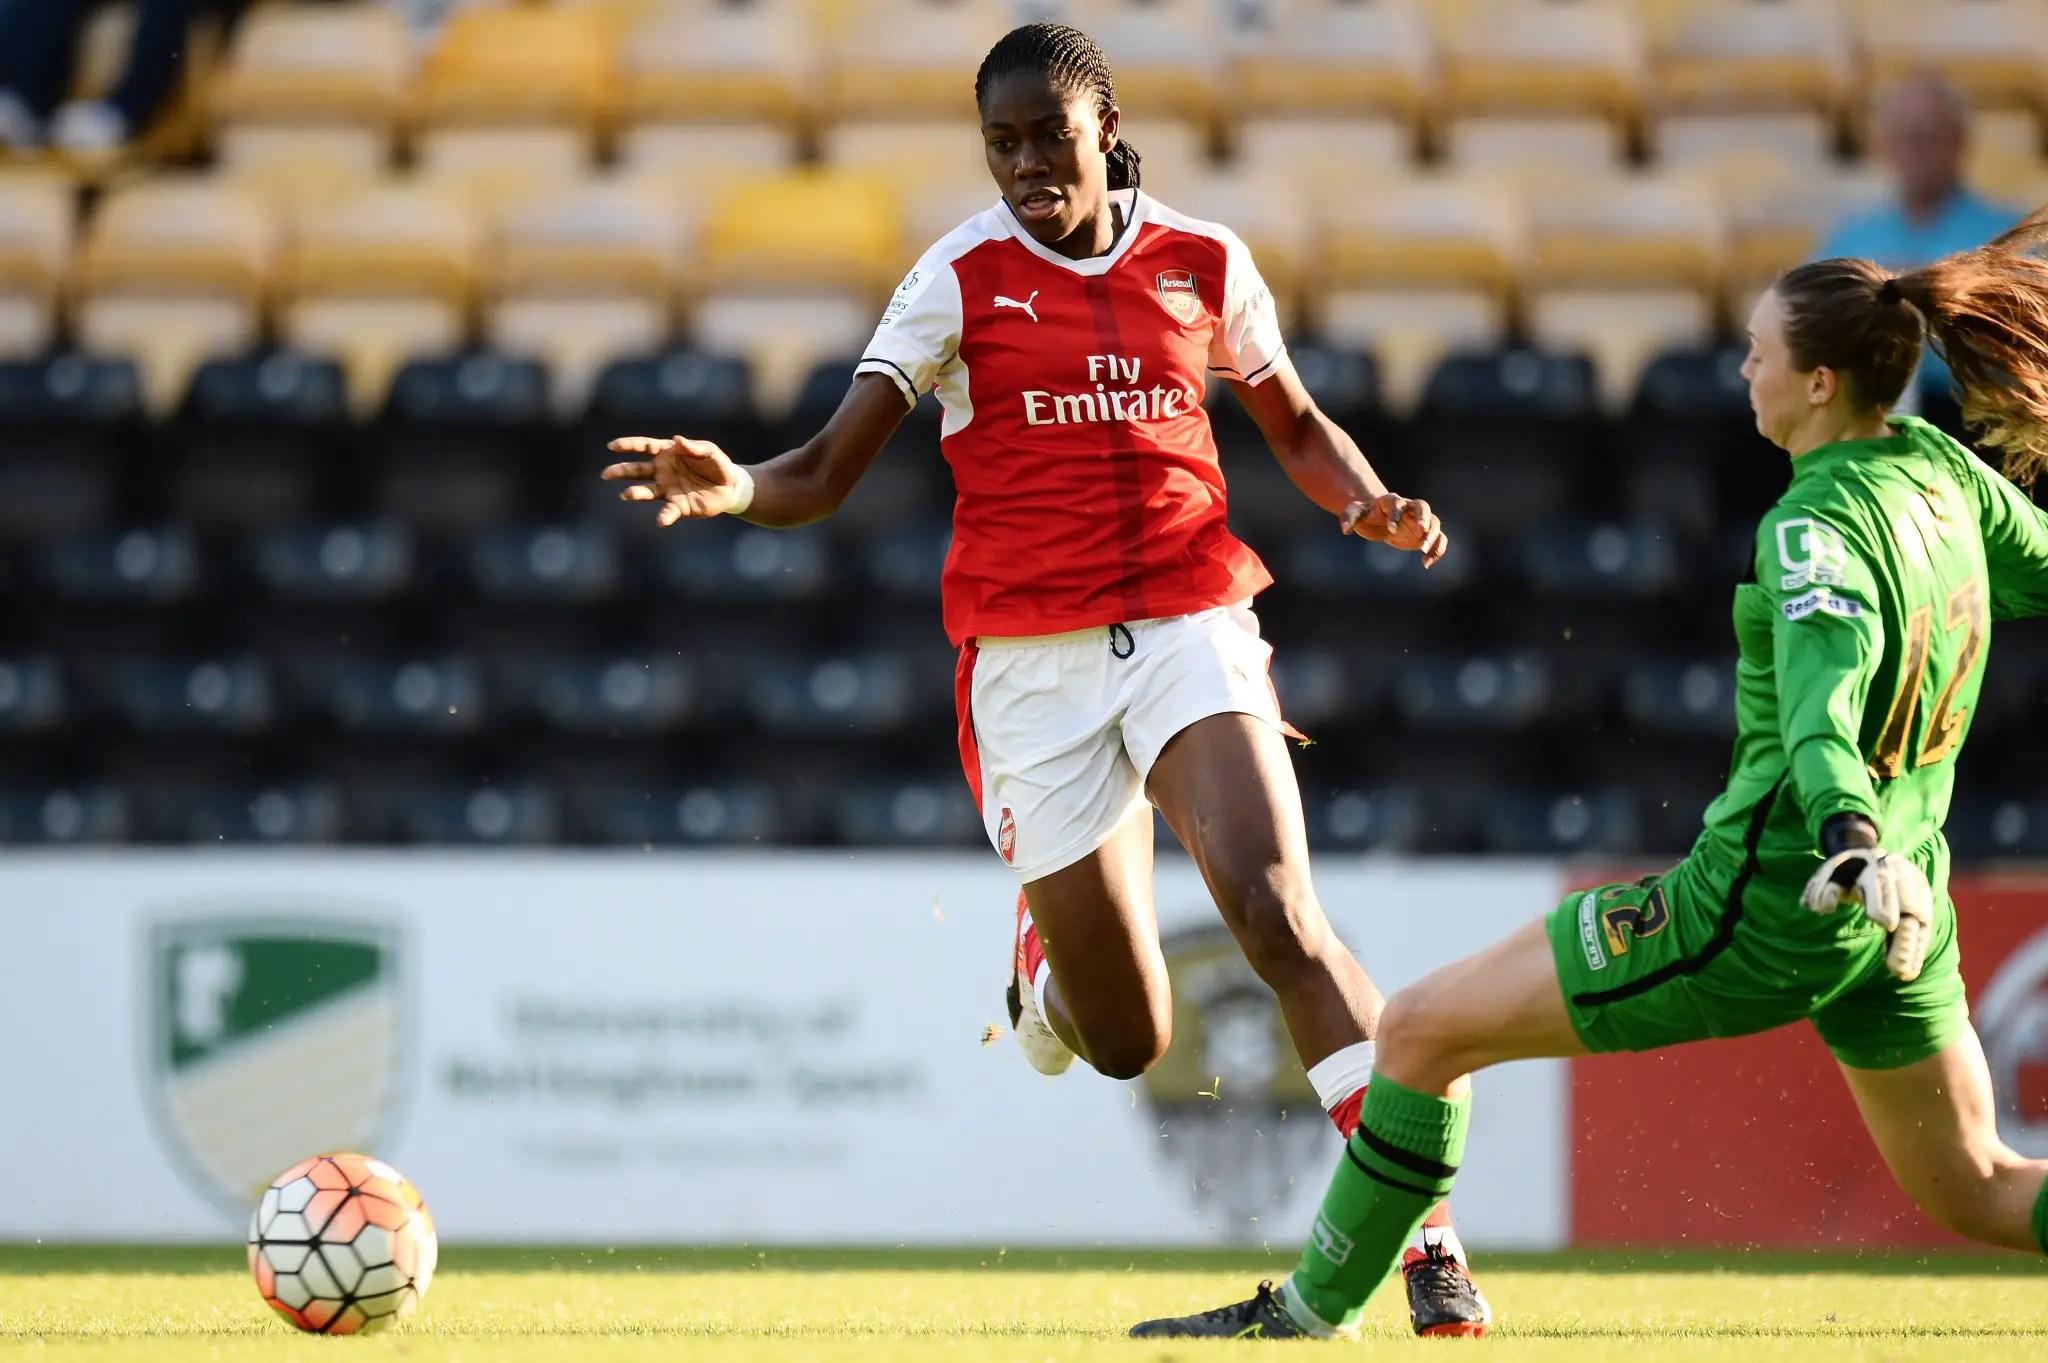 Oshoala On Target As Arsenal Ladies Outscore Notts County